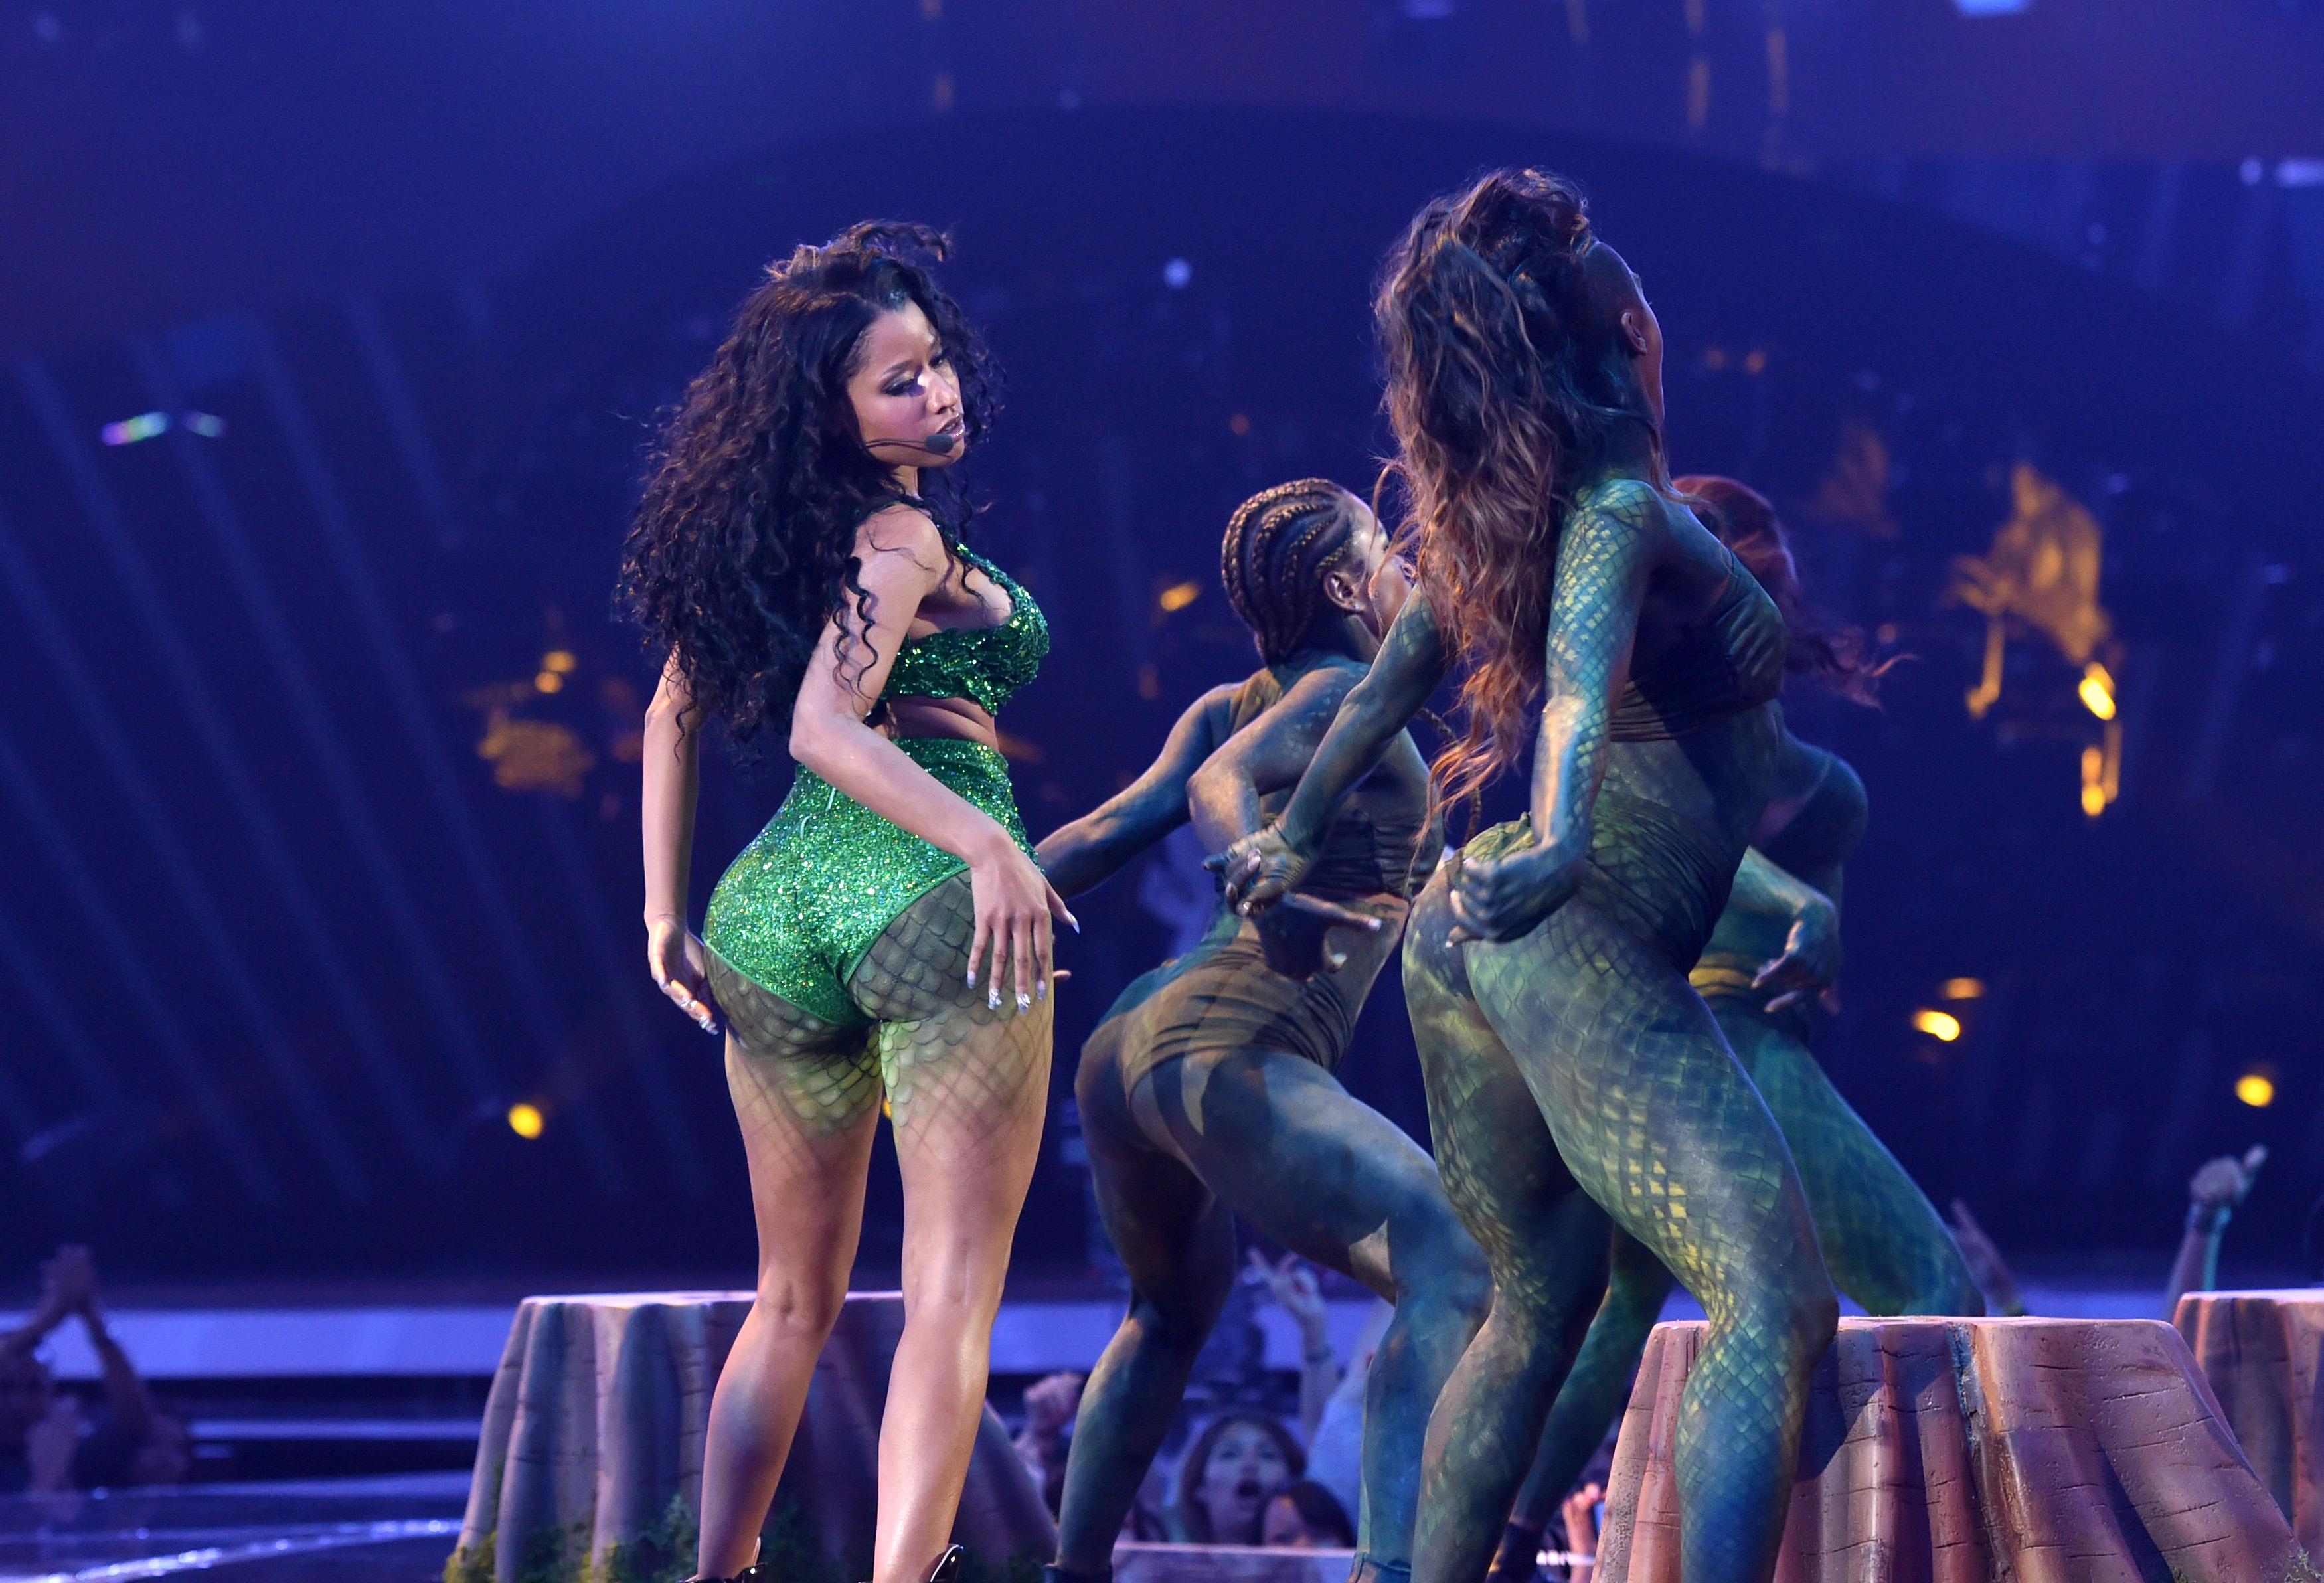 Nicki Minaj Brings Wardrobe Malfunction, Ditches Snake for 2014 VMAs